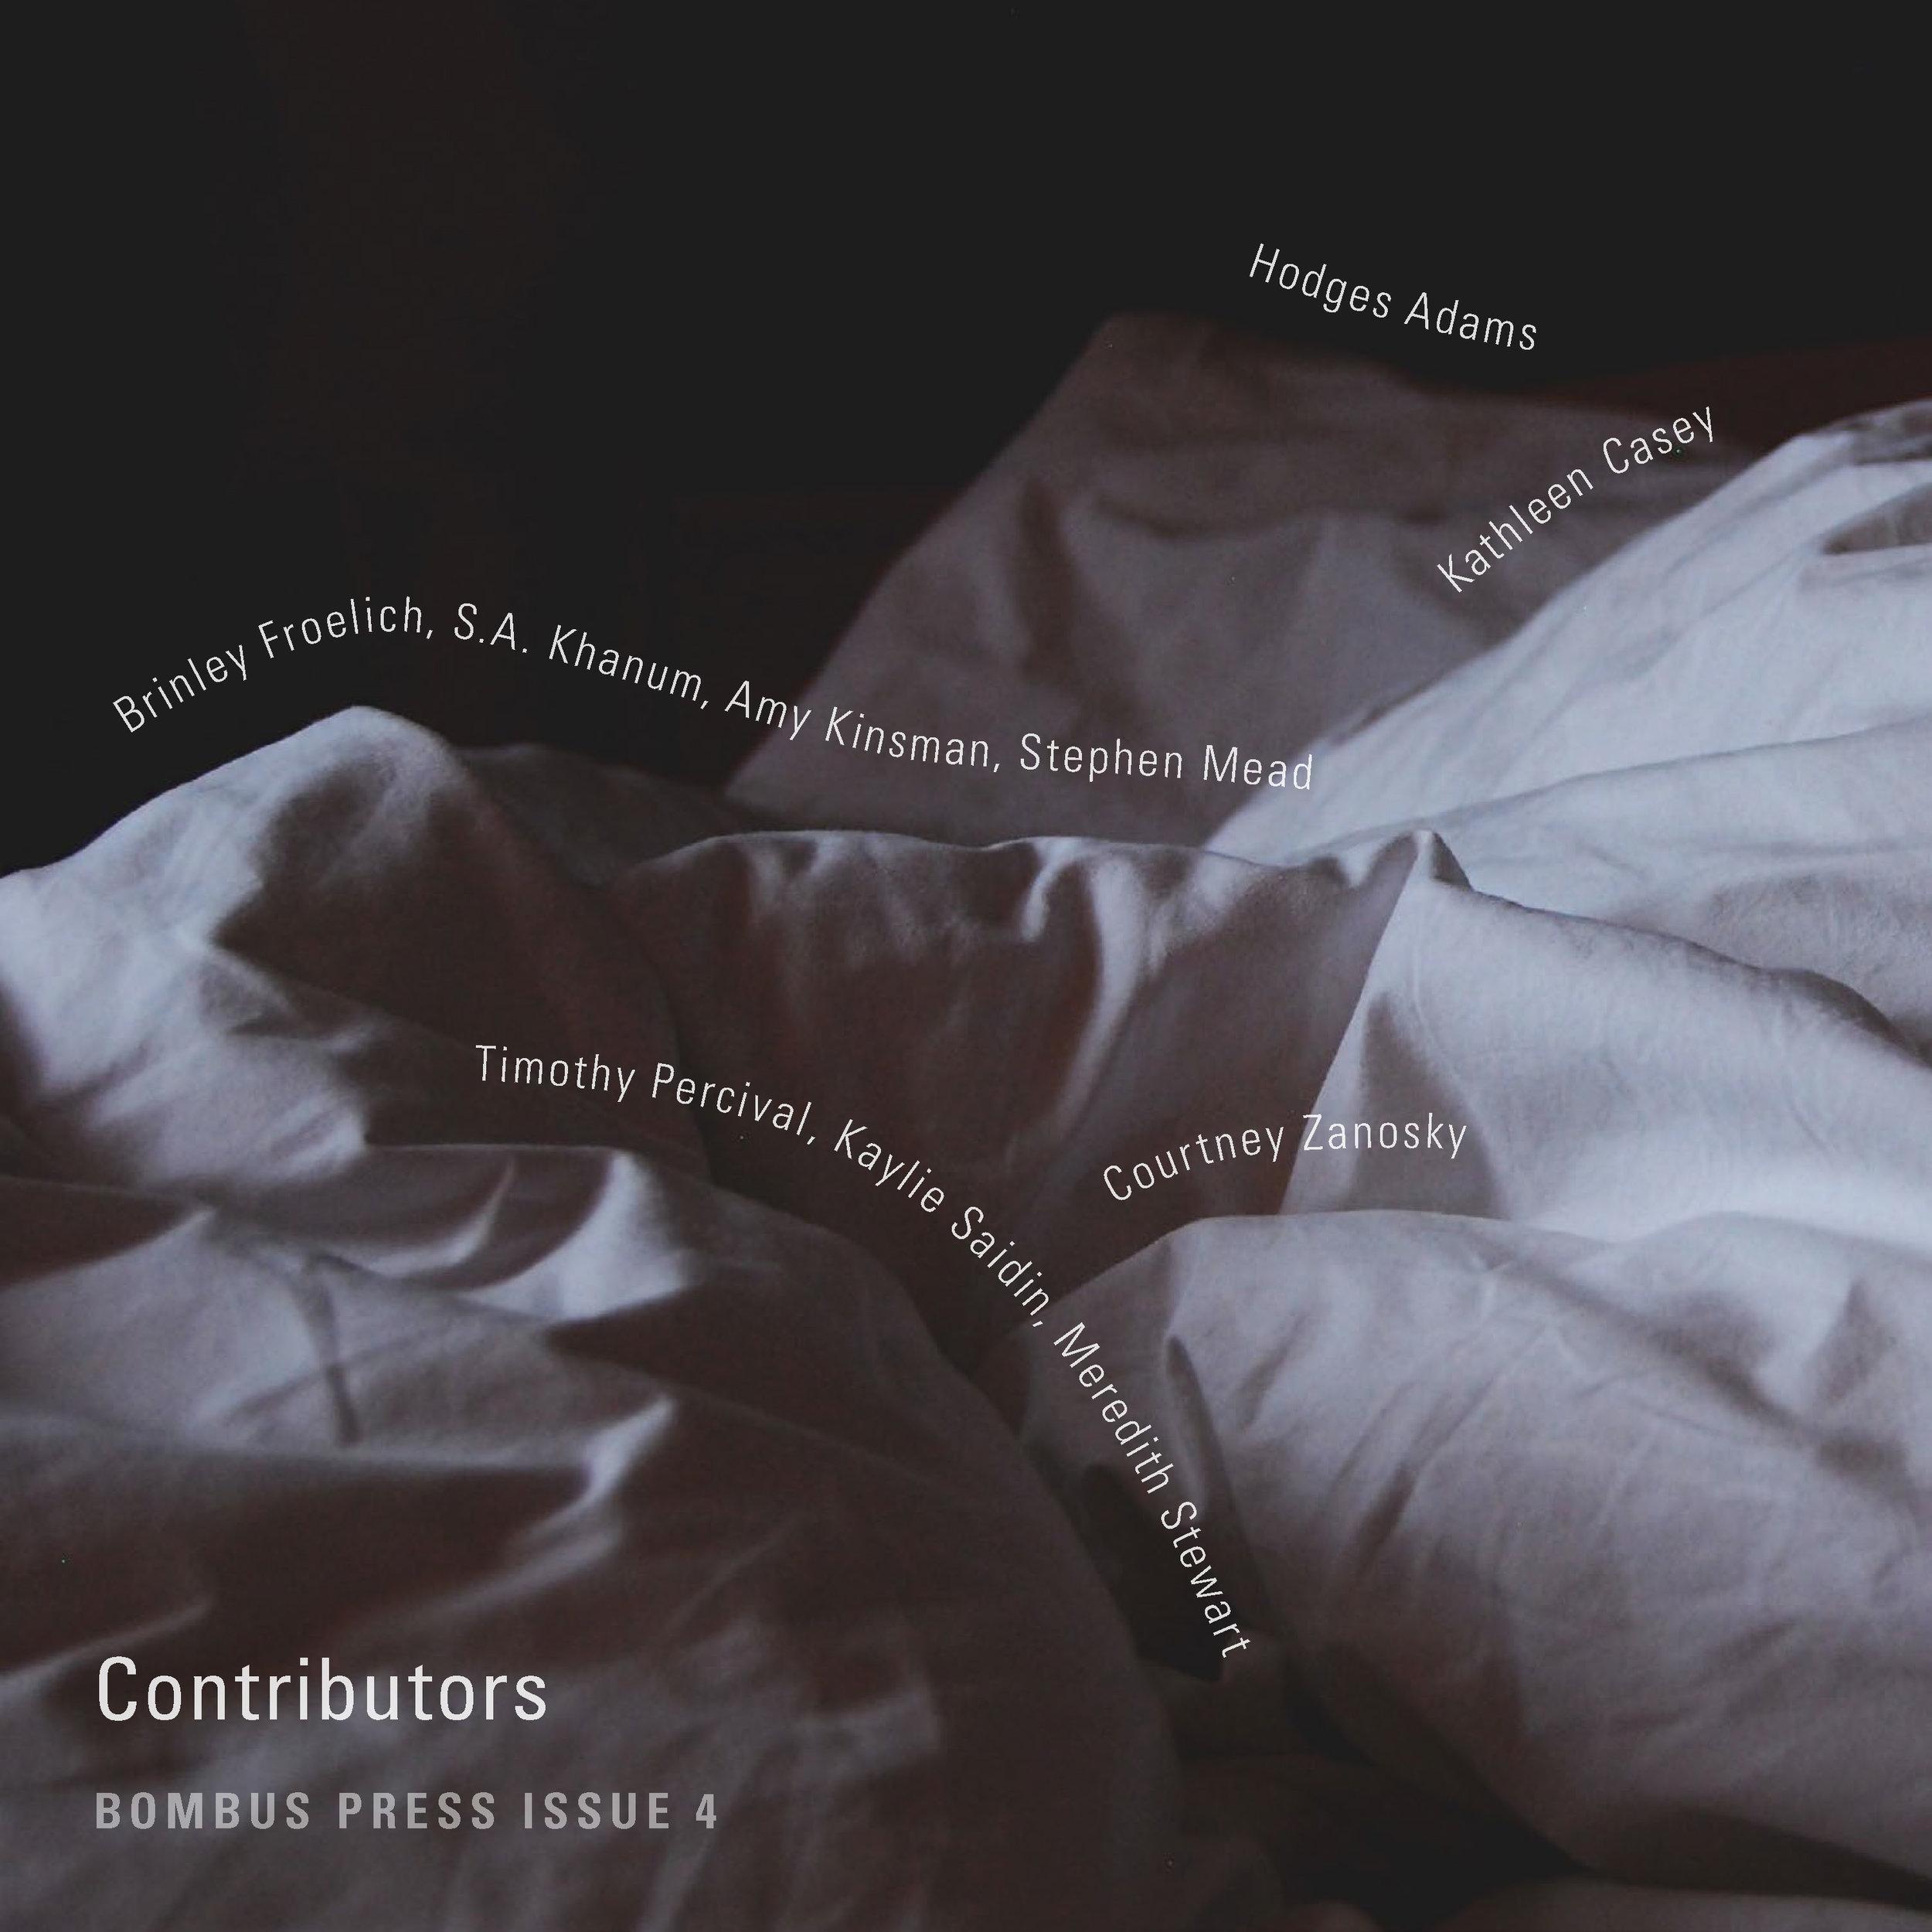 bp 4 contributors 10-29.1.jpg